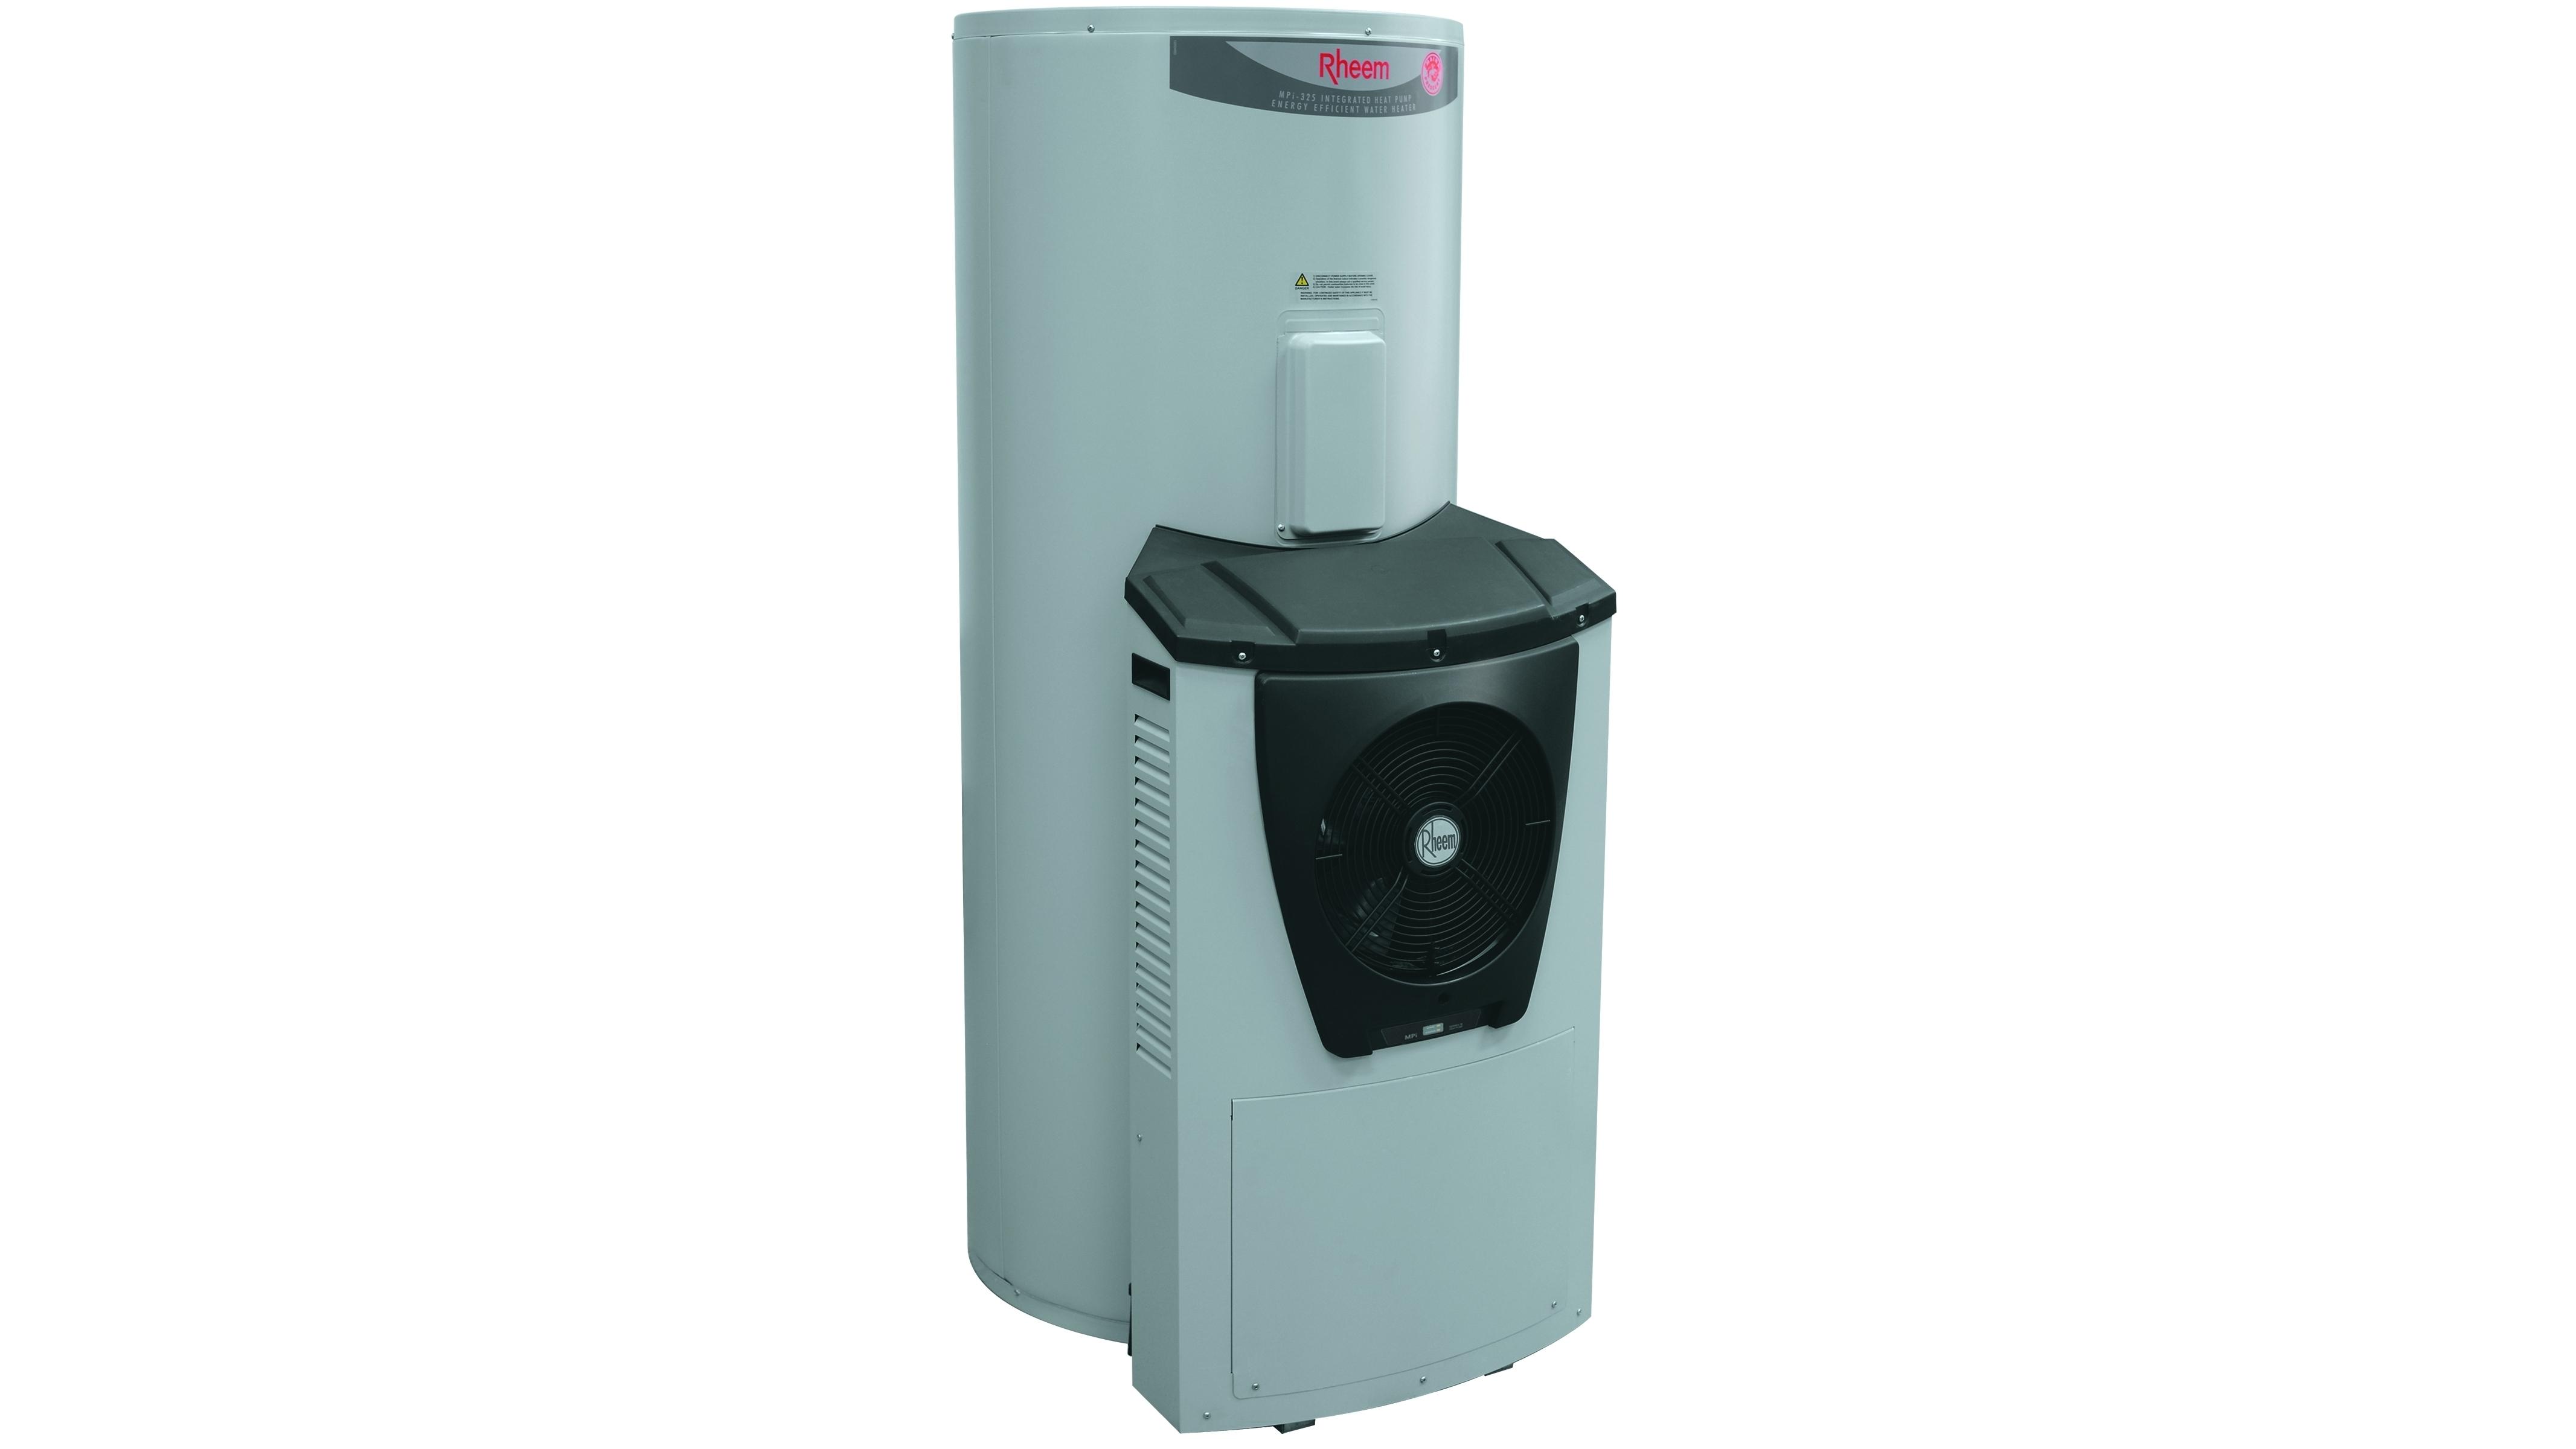 Buy Rheem Mpi-325 Series II Electric Heat Pump Hot Water System ...